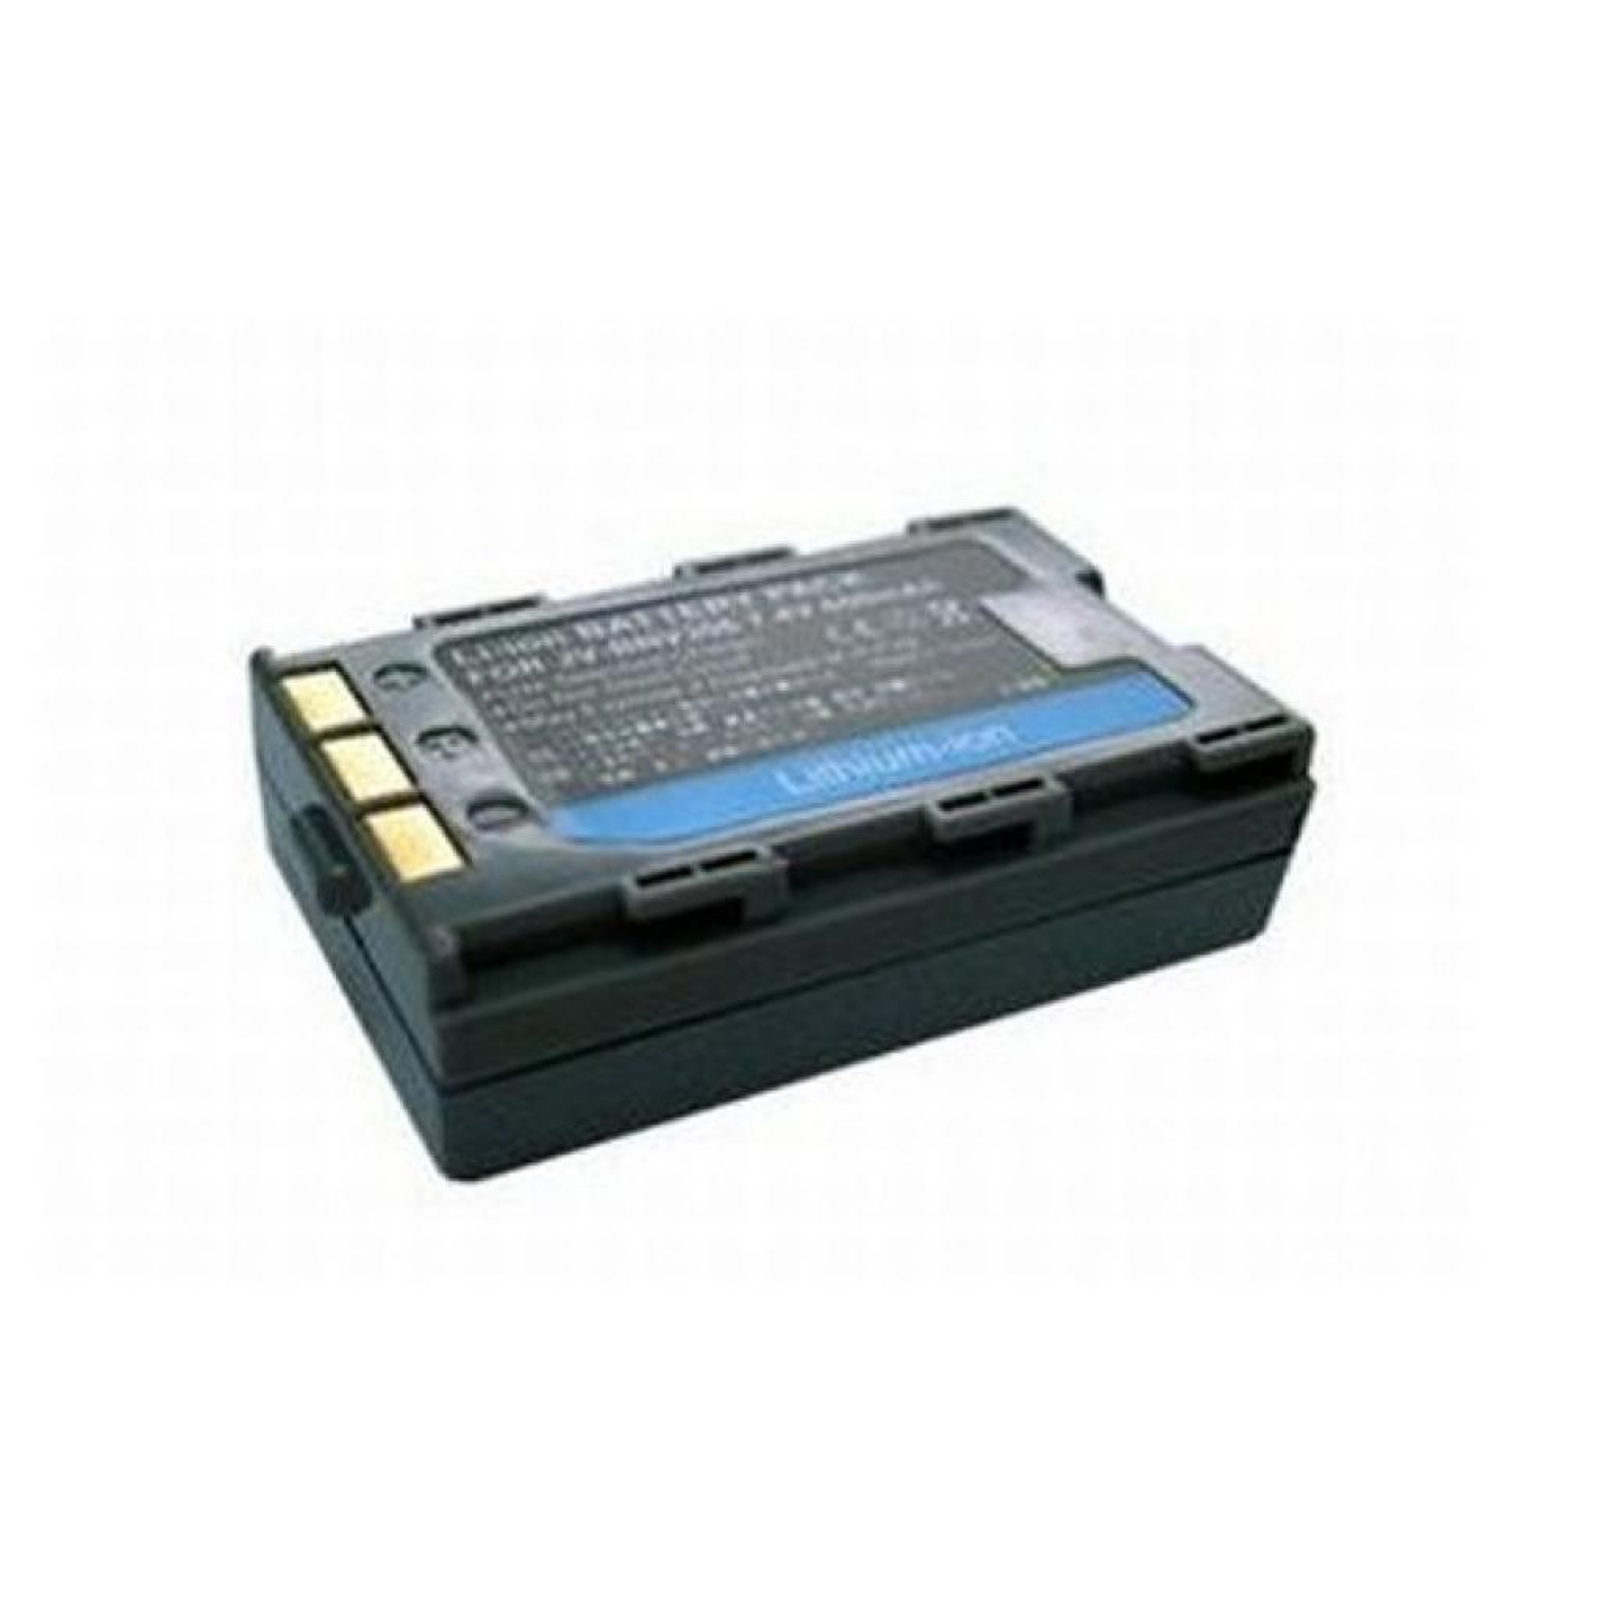 Аккумулятор к фото/видео EXTRADIGITAL JVC BN-V306U (DV00DV1068)